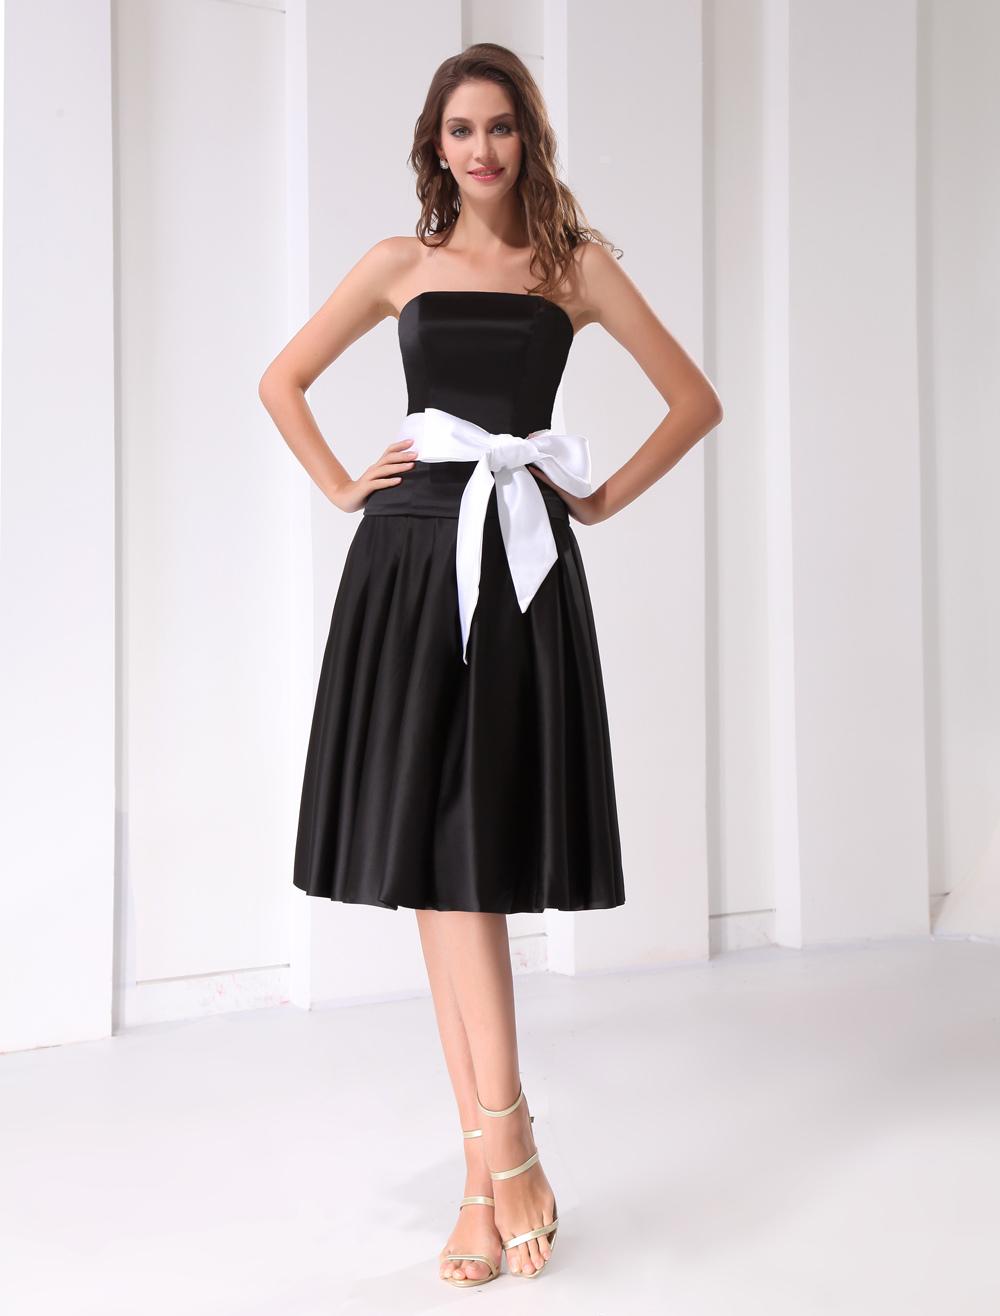 Strapless Knee-Length Prom Dress (Wedding Cheap Party Dress) photo